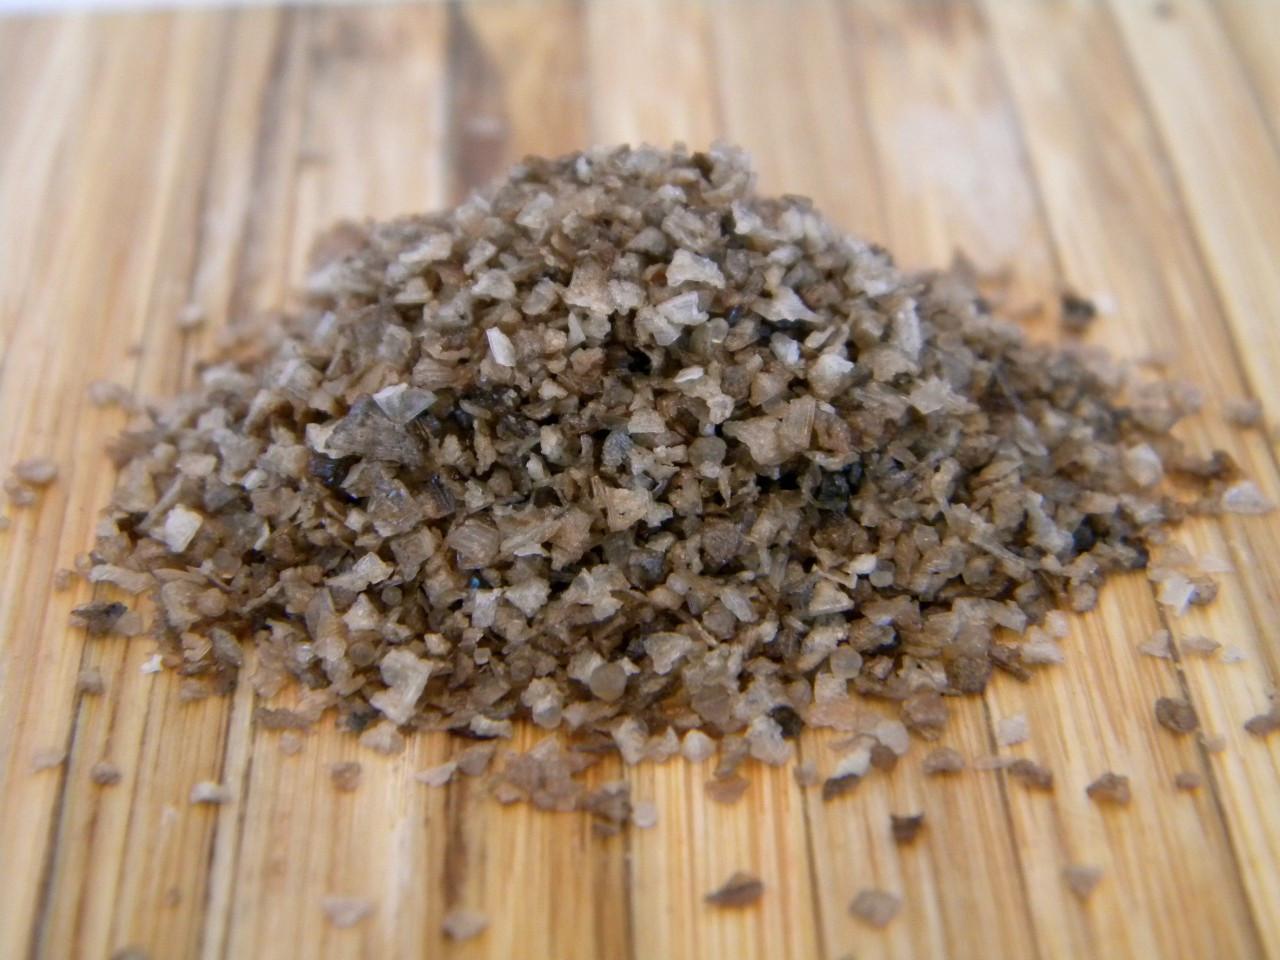 ... Smoked Sea Salt (loose salt) by go lb. salt ® - store.golbsalt.com